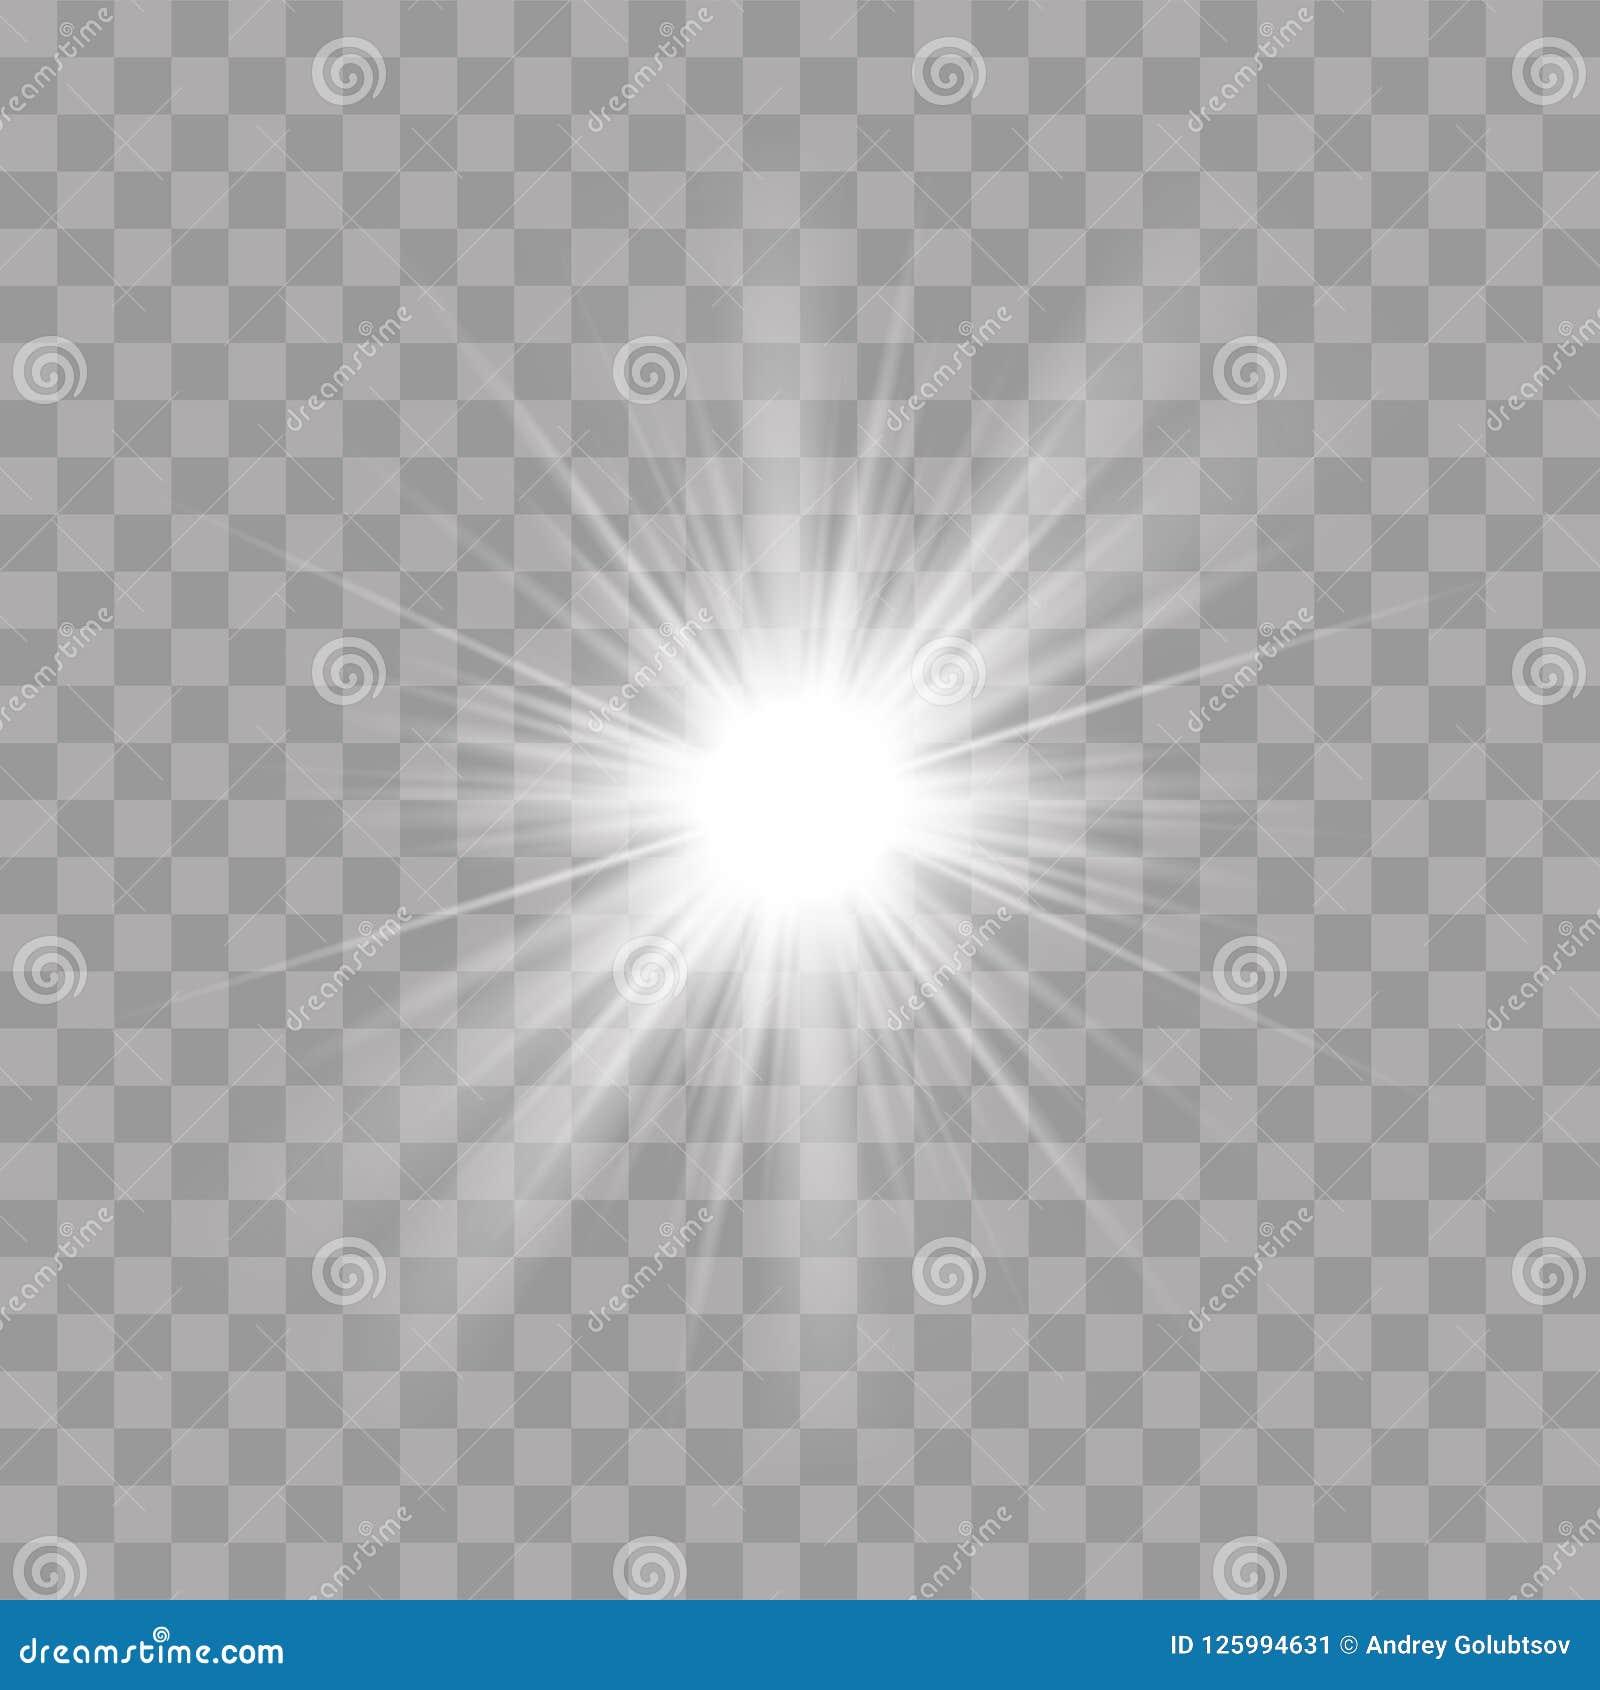 Light rays shine radiance flash sun star effect